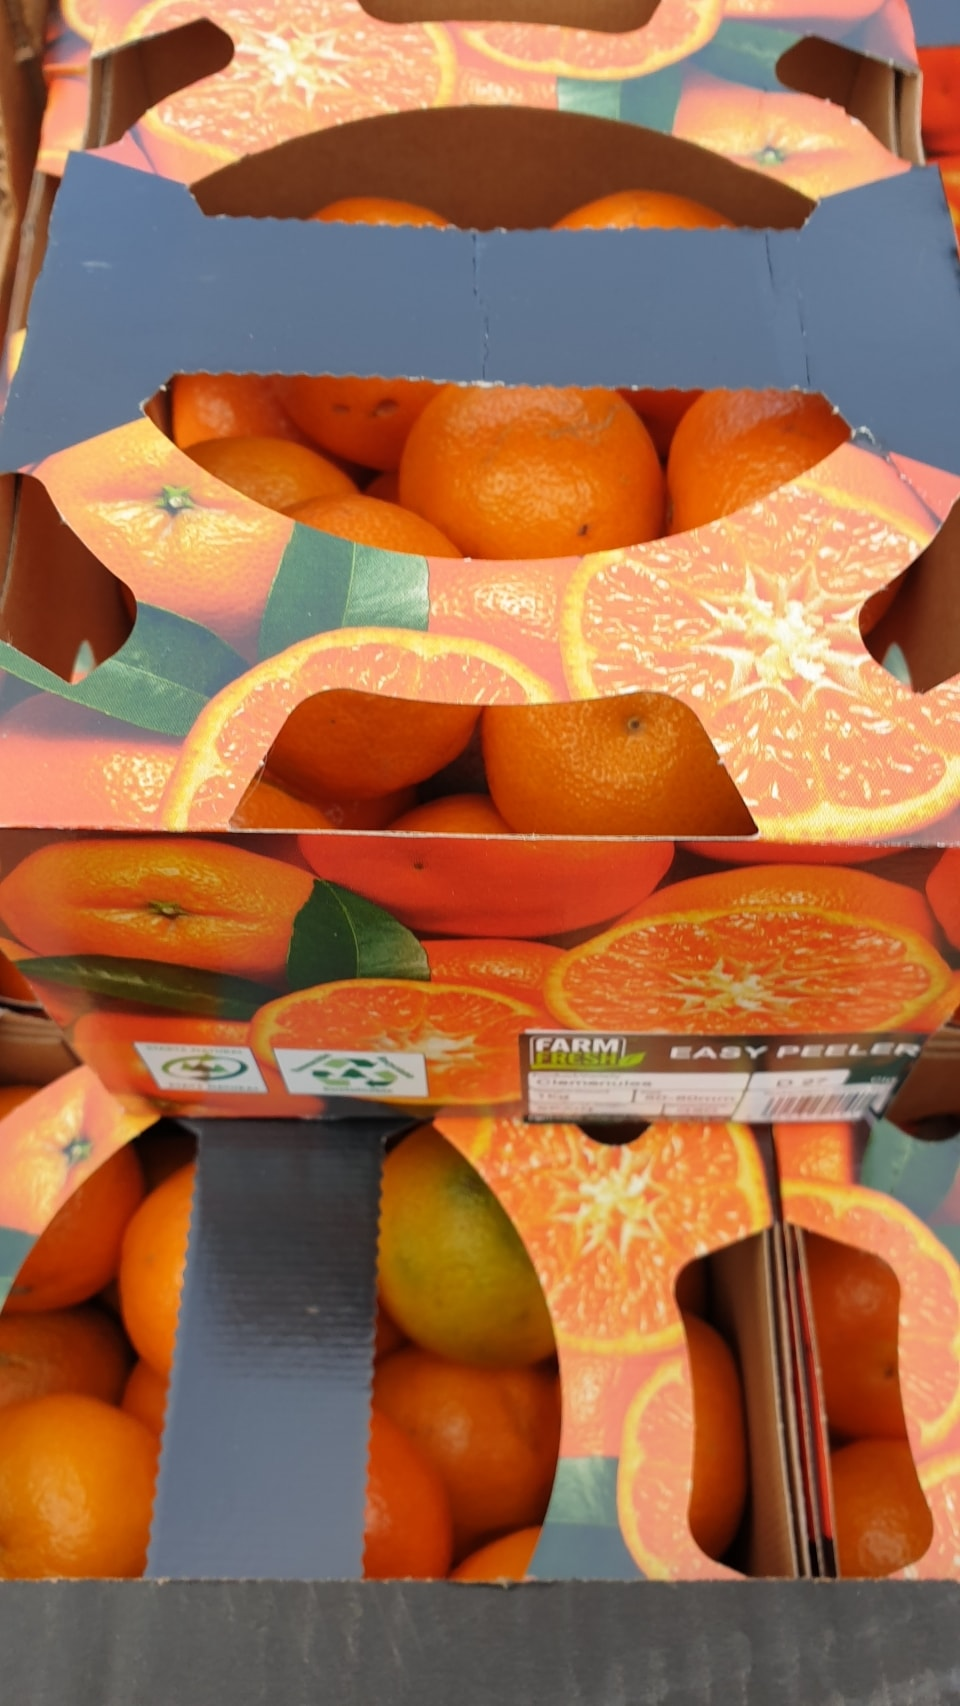 Clementine easy peelers